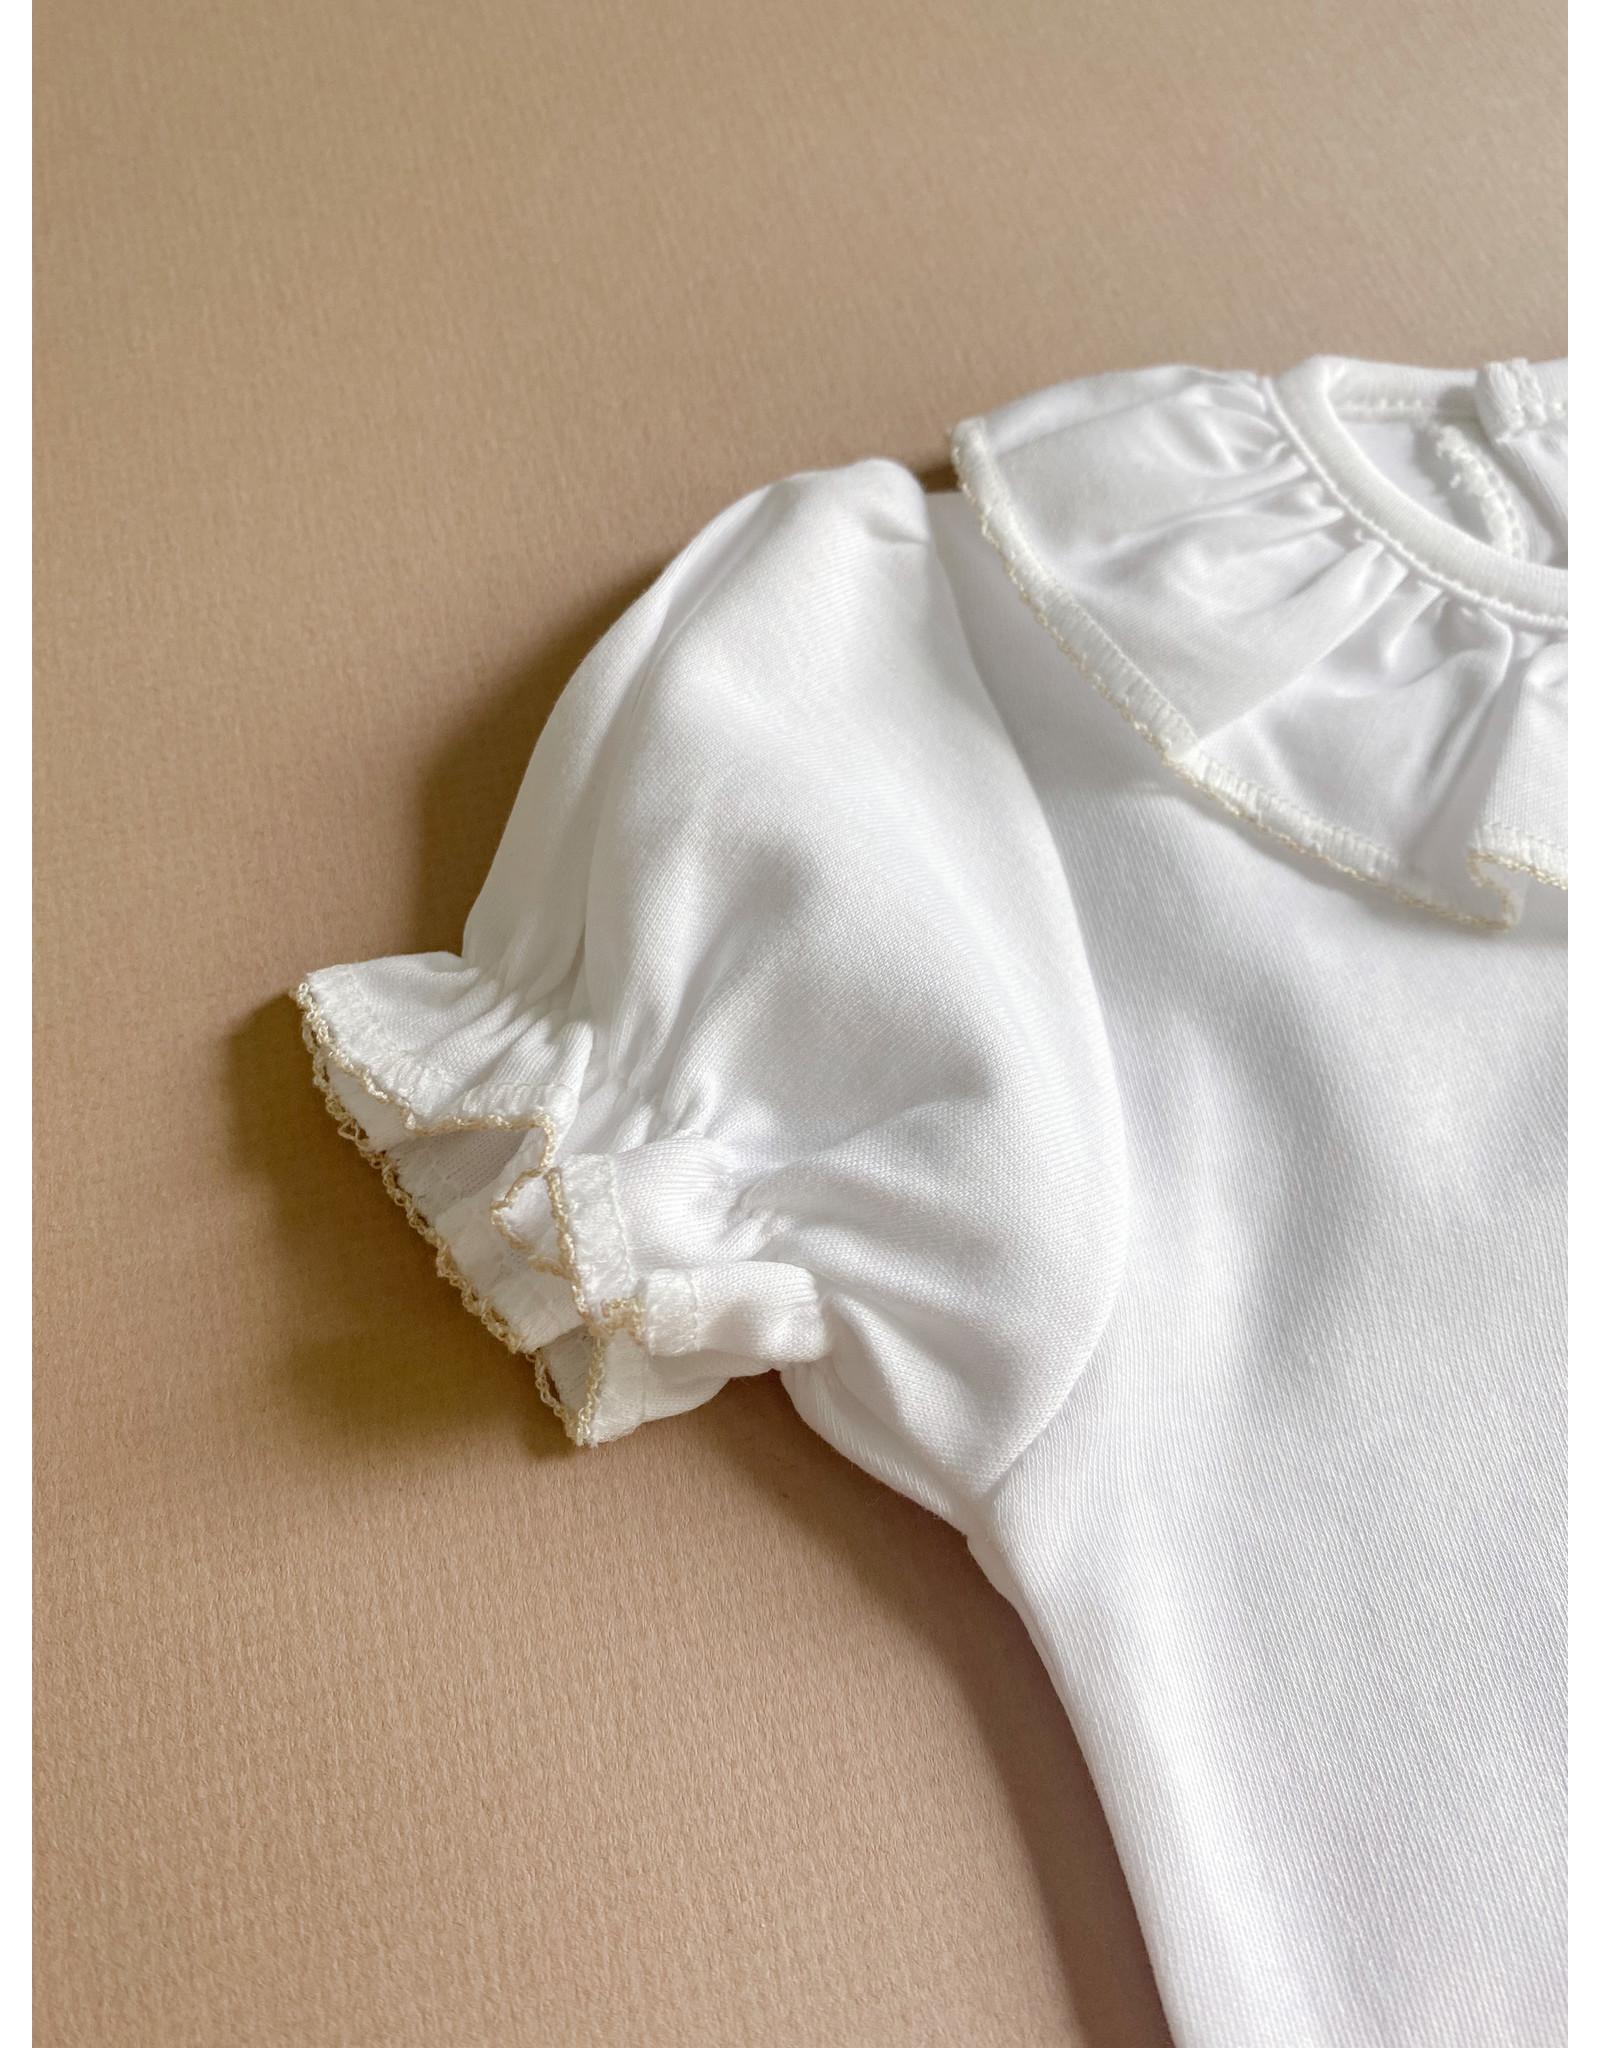 MINHON White with Beige Trim Ruffles Bodyvest